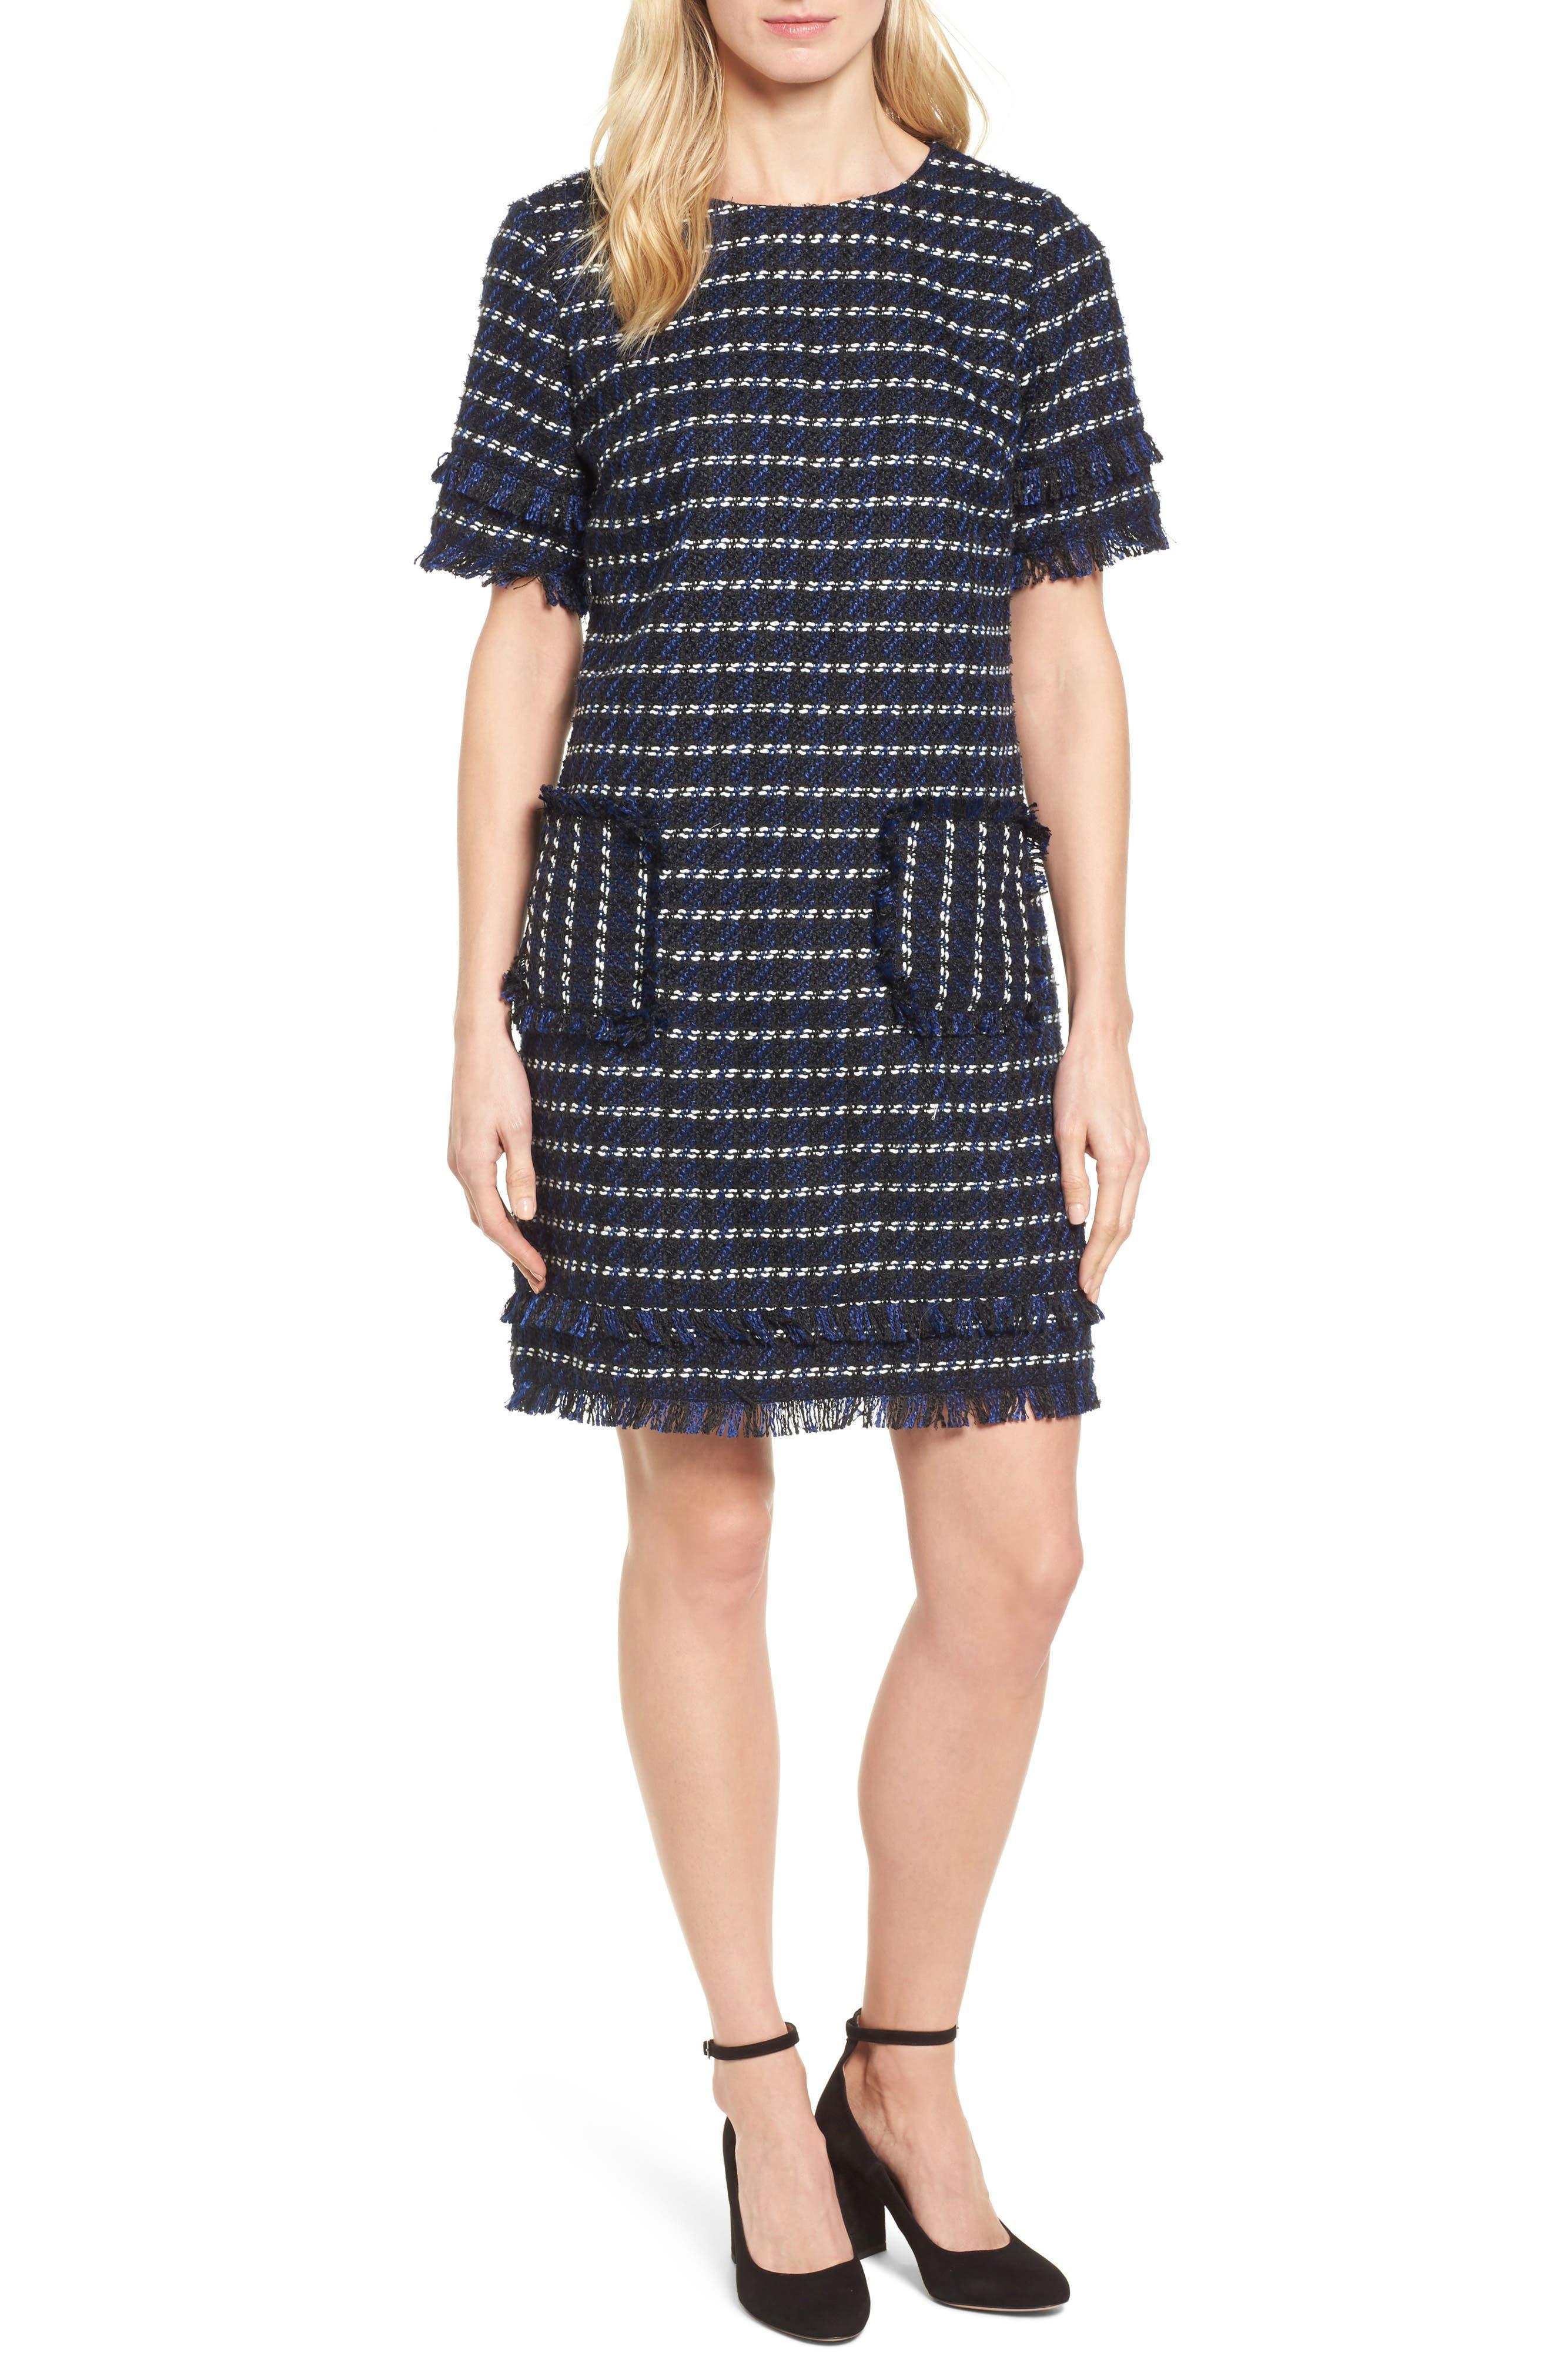 Fringe Tweed Dress,                             Main thumbnail 1, color,                             Black- Navy Tweed